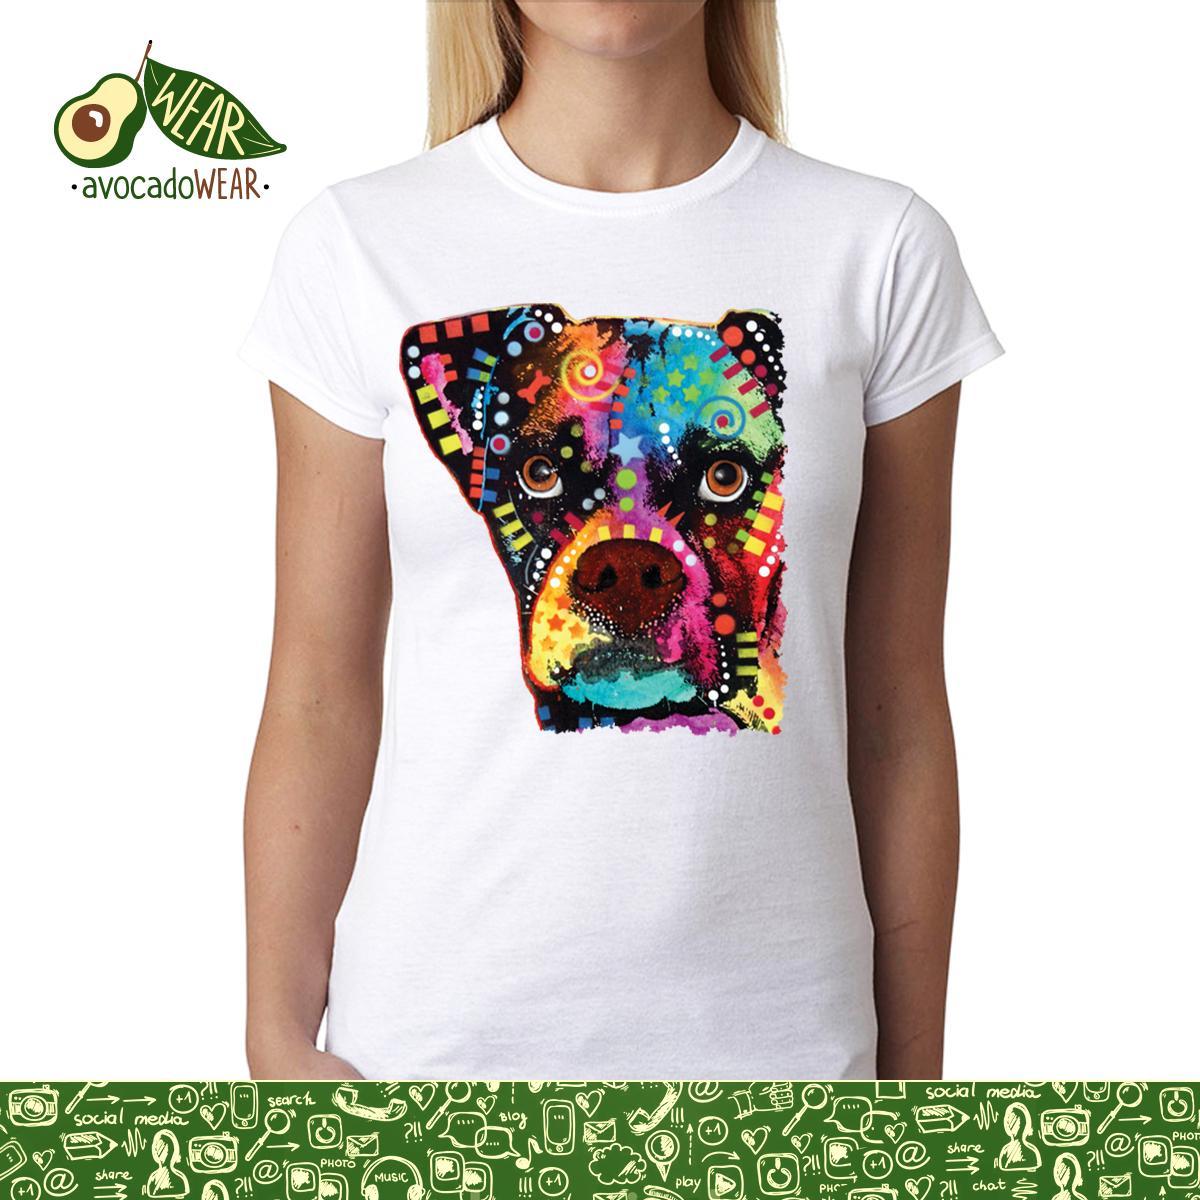 Dean-Russo-Boxer-Farbig-Kubismus-Damen-T-shirt-